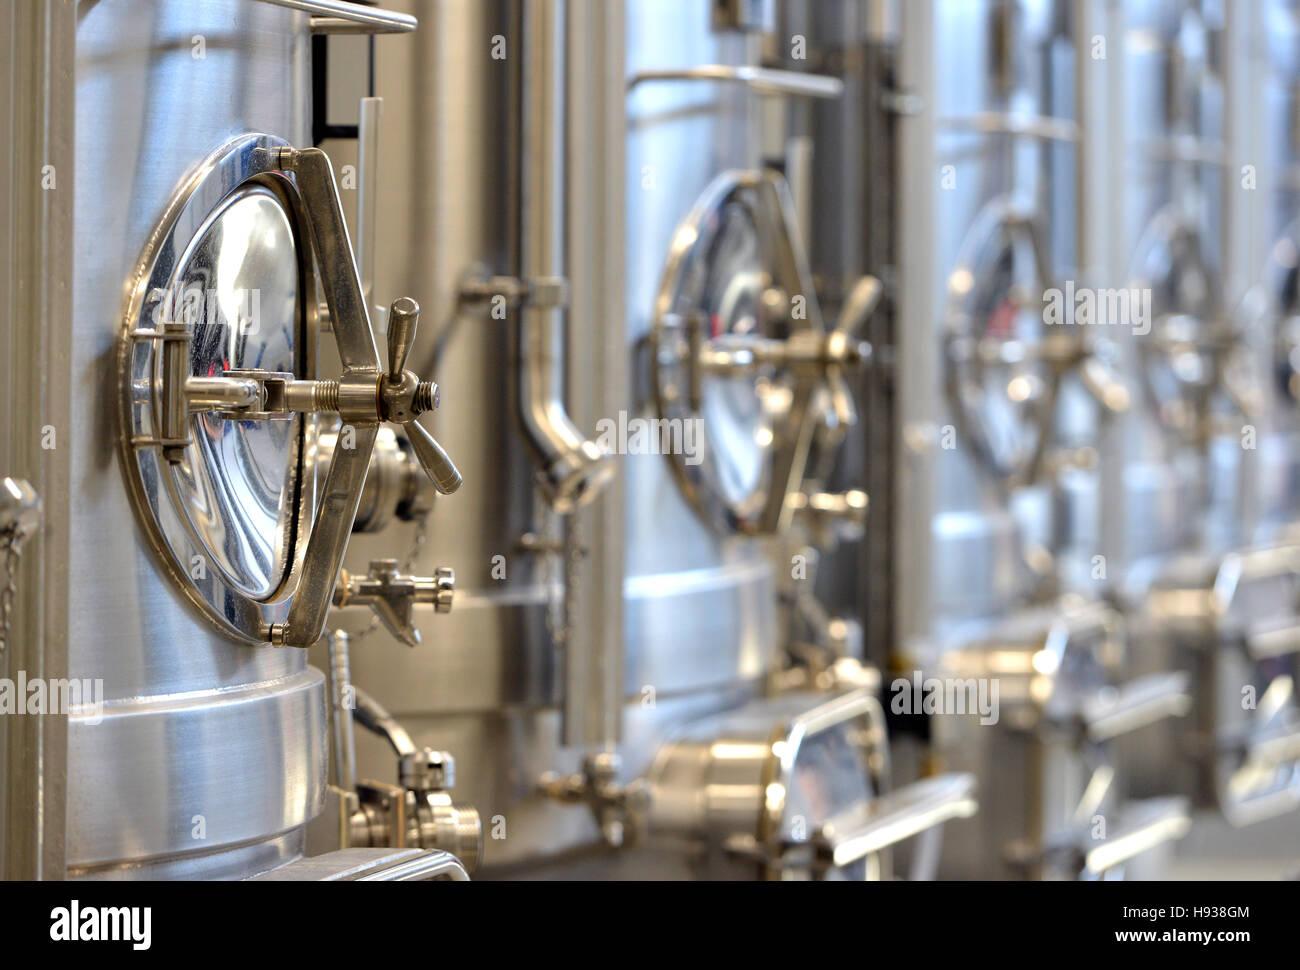 Stainless steel wine making stills - Stock Image